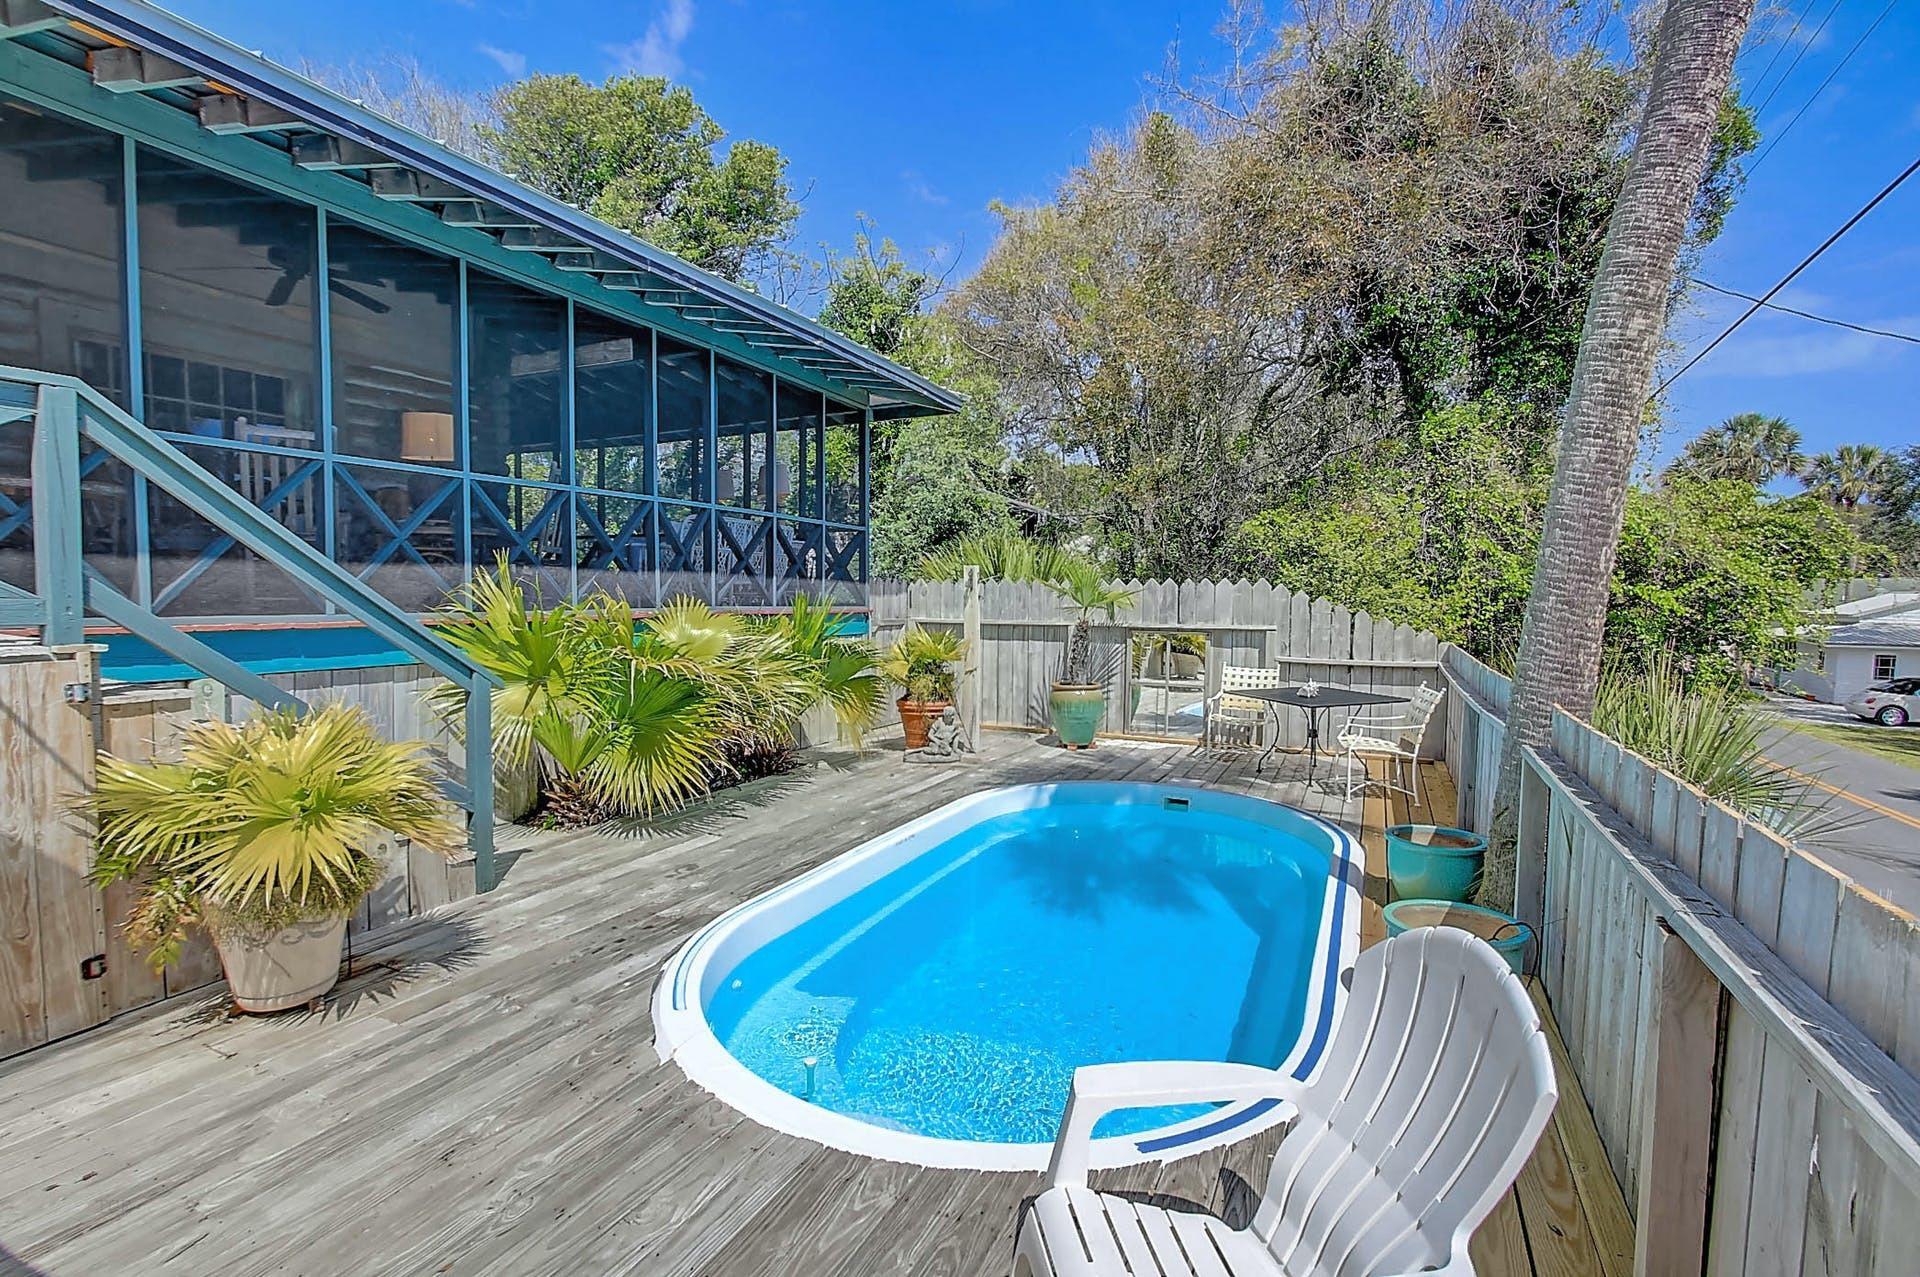 Folly Beach Homes For Sale - 306 Cooper, Folly Beach, SC - 0